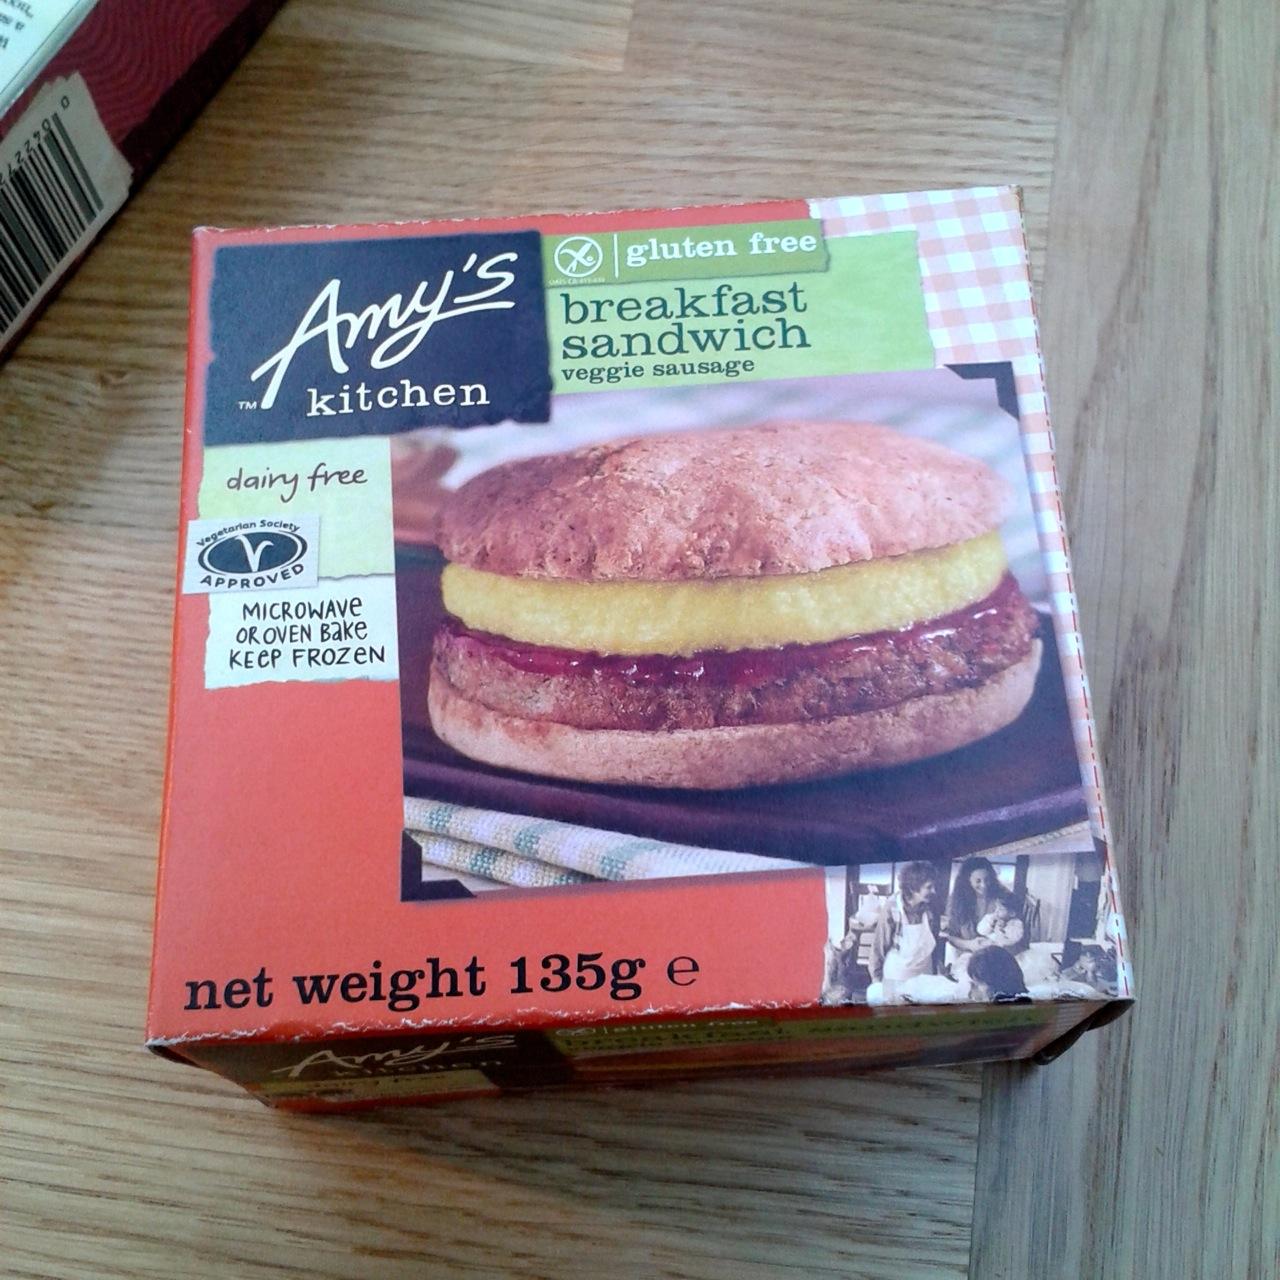 https://i2.wp.com/fatgayvegan.com/wp-content/uploads/2014/07/amys-sandwich.jpg?fit=1280%2C1280